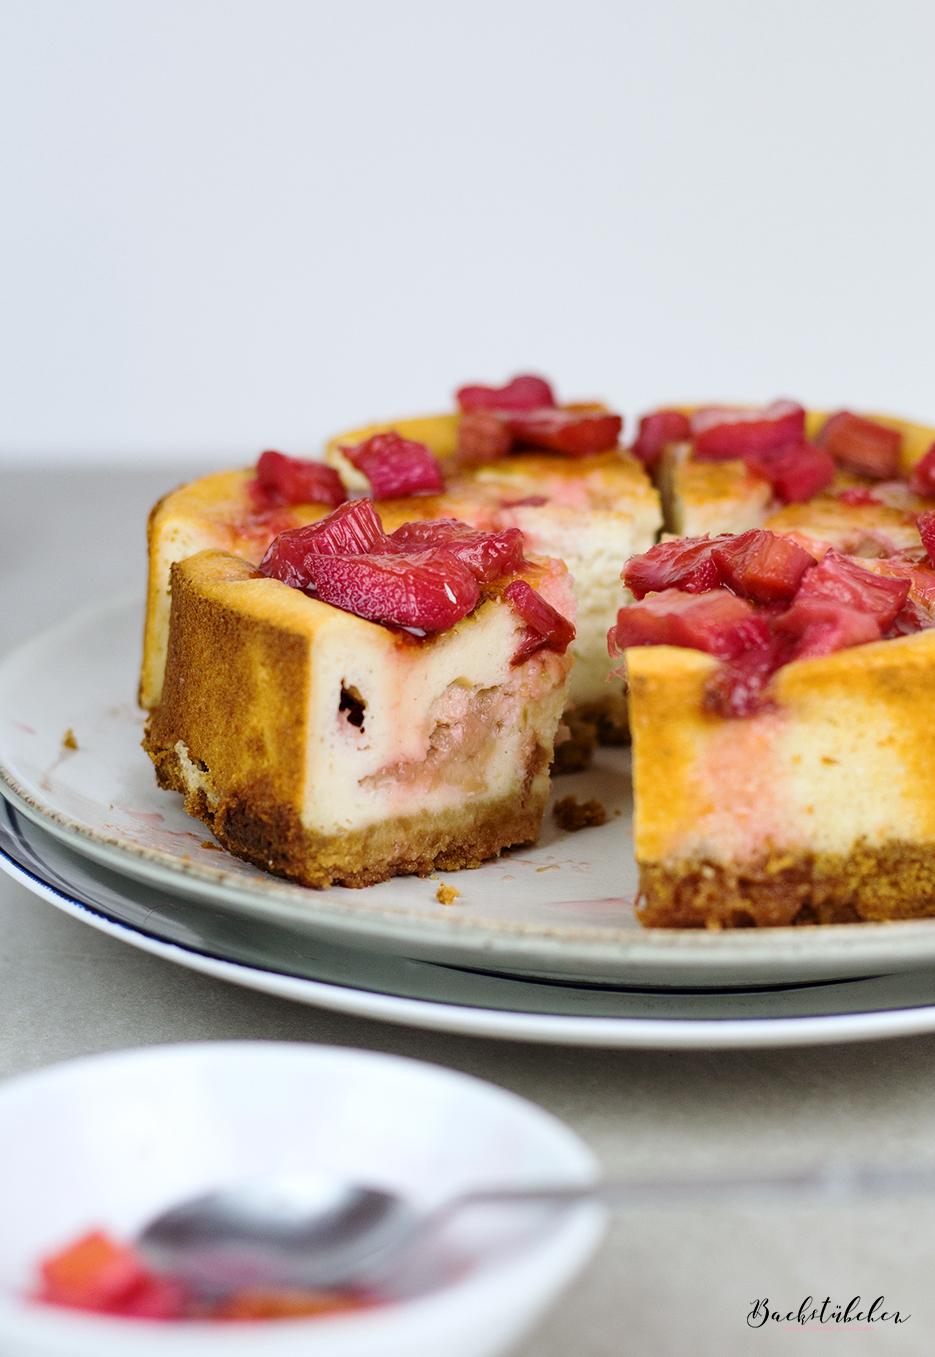 Rhabarber-Cheesecake2.jpg